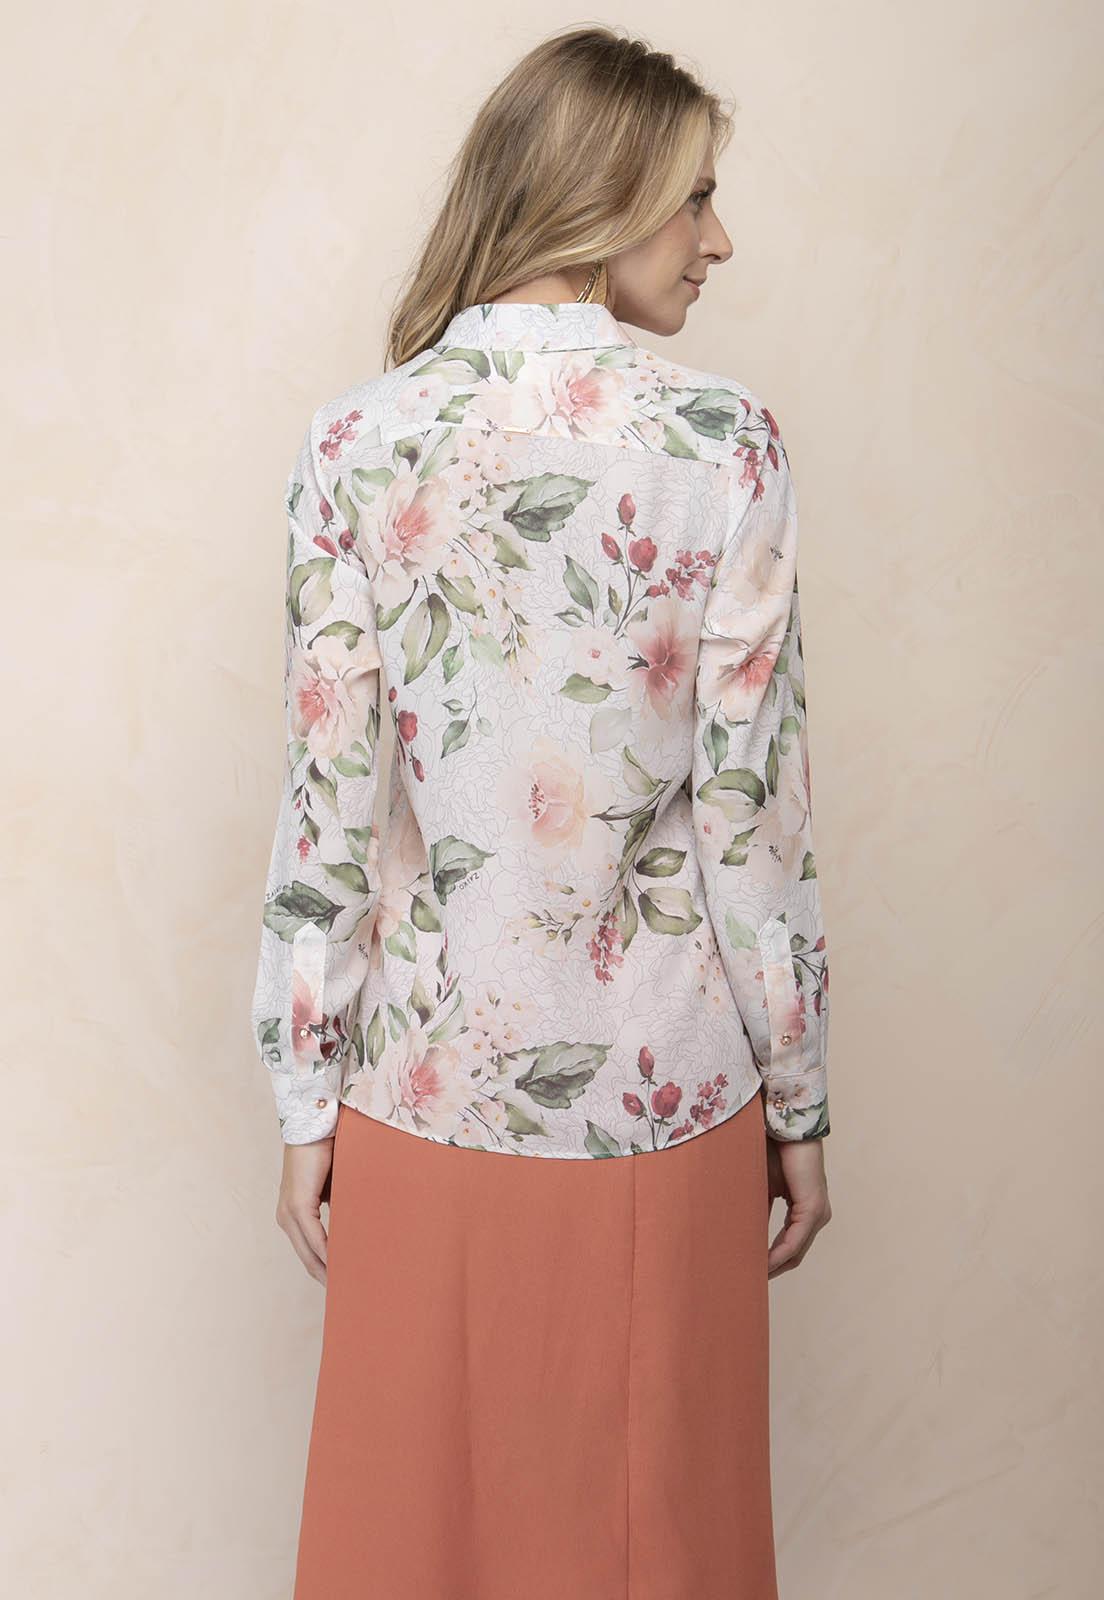 Camisa Feminina Zaiko Estampada Floral Manga Longa 2507